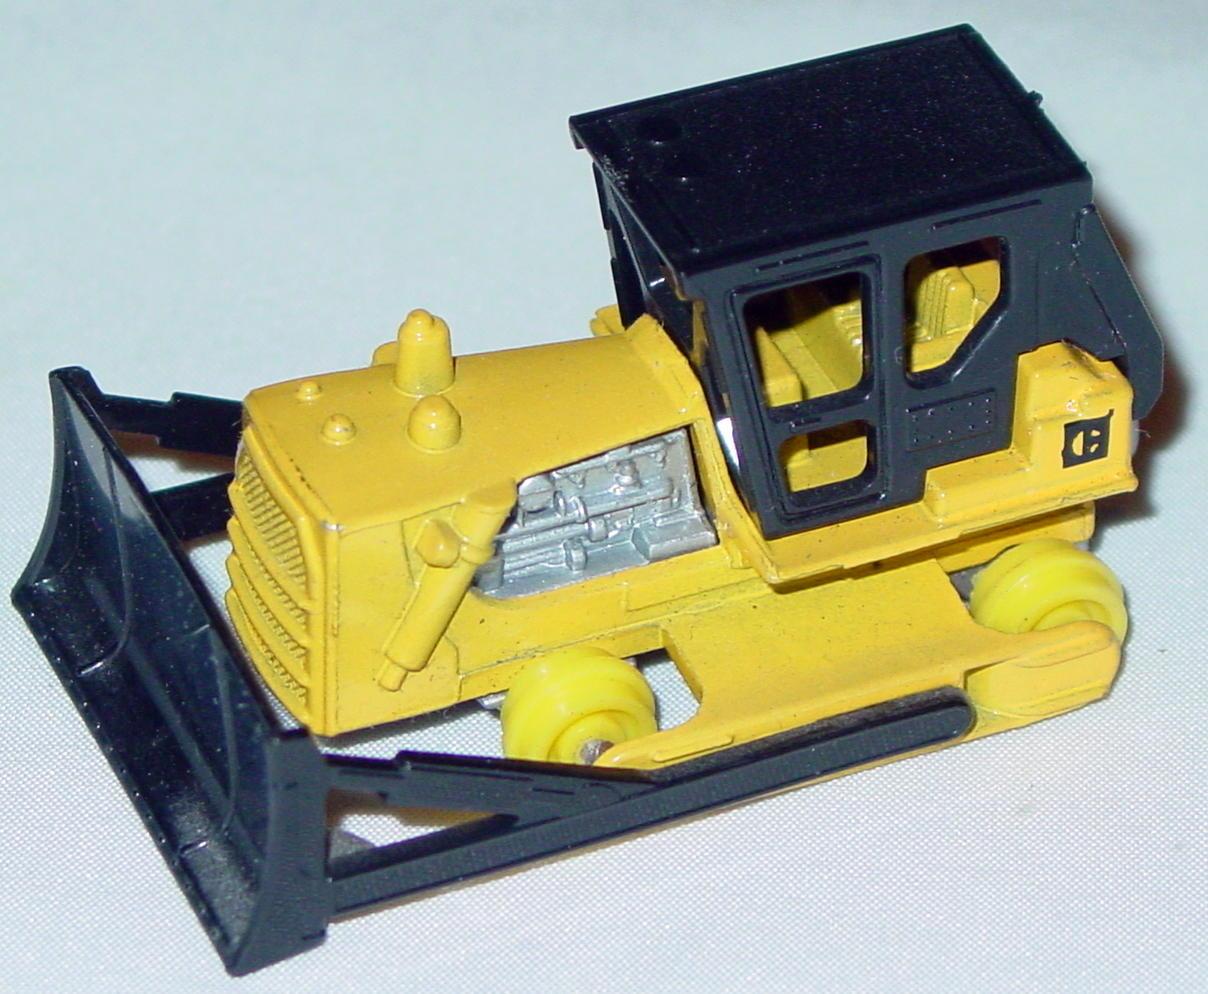 Lesney SuperFast 64 D 13 - Cat Dozer yellow yellow unp lem roll tan canopy  C 1 trd